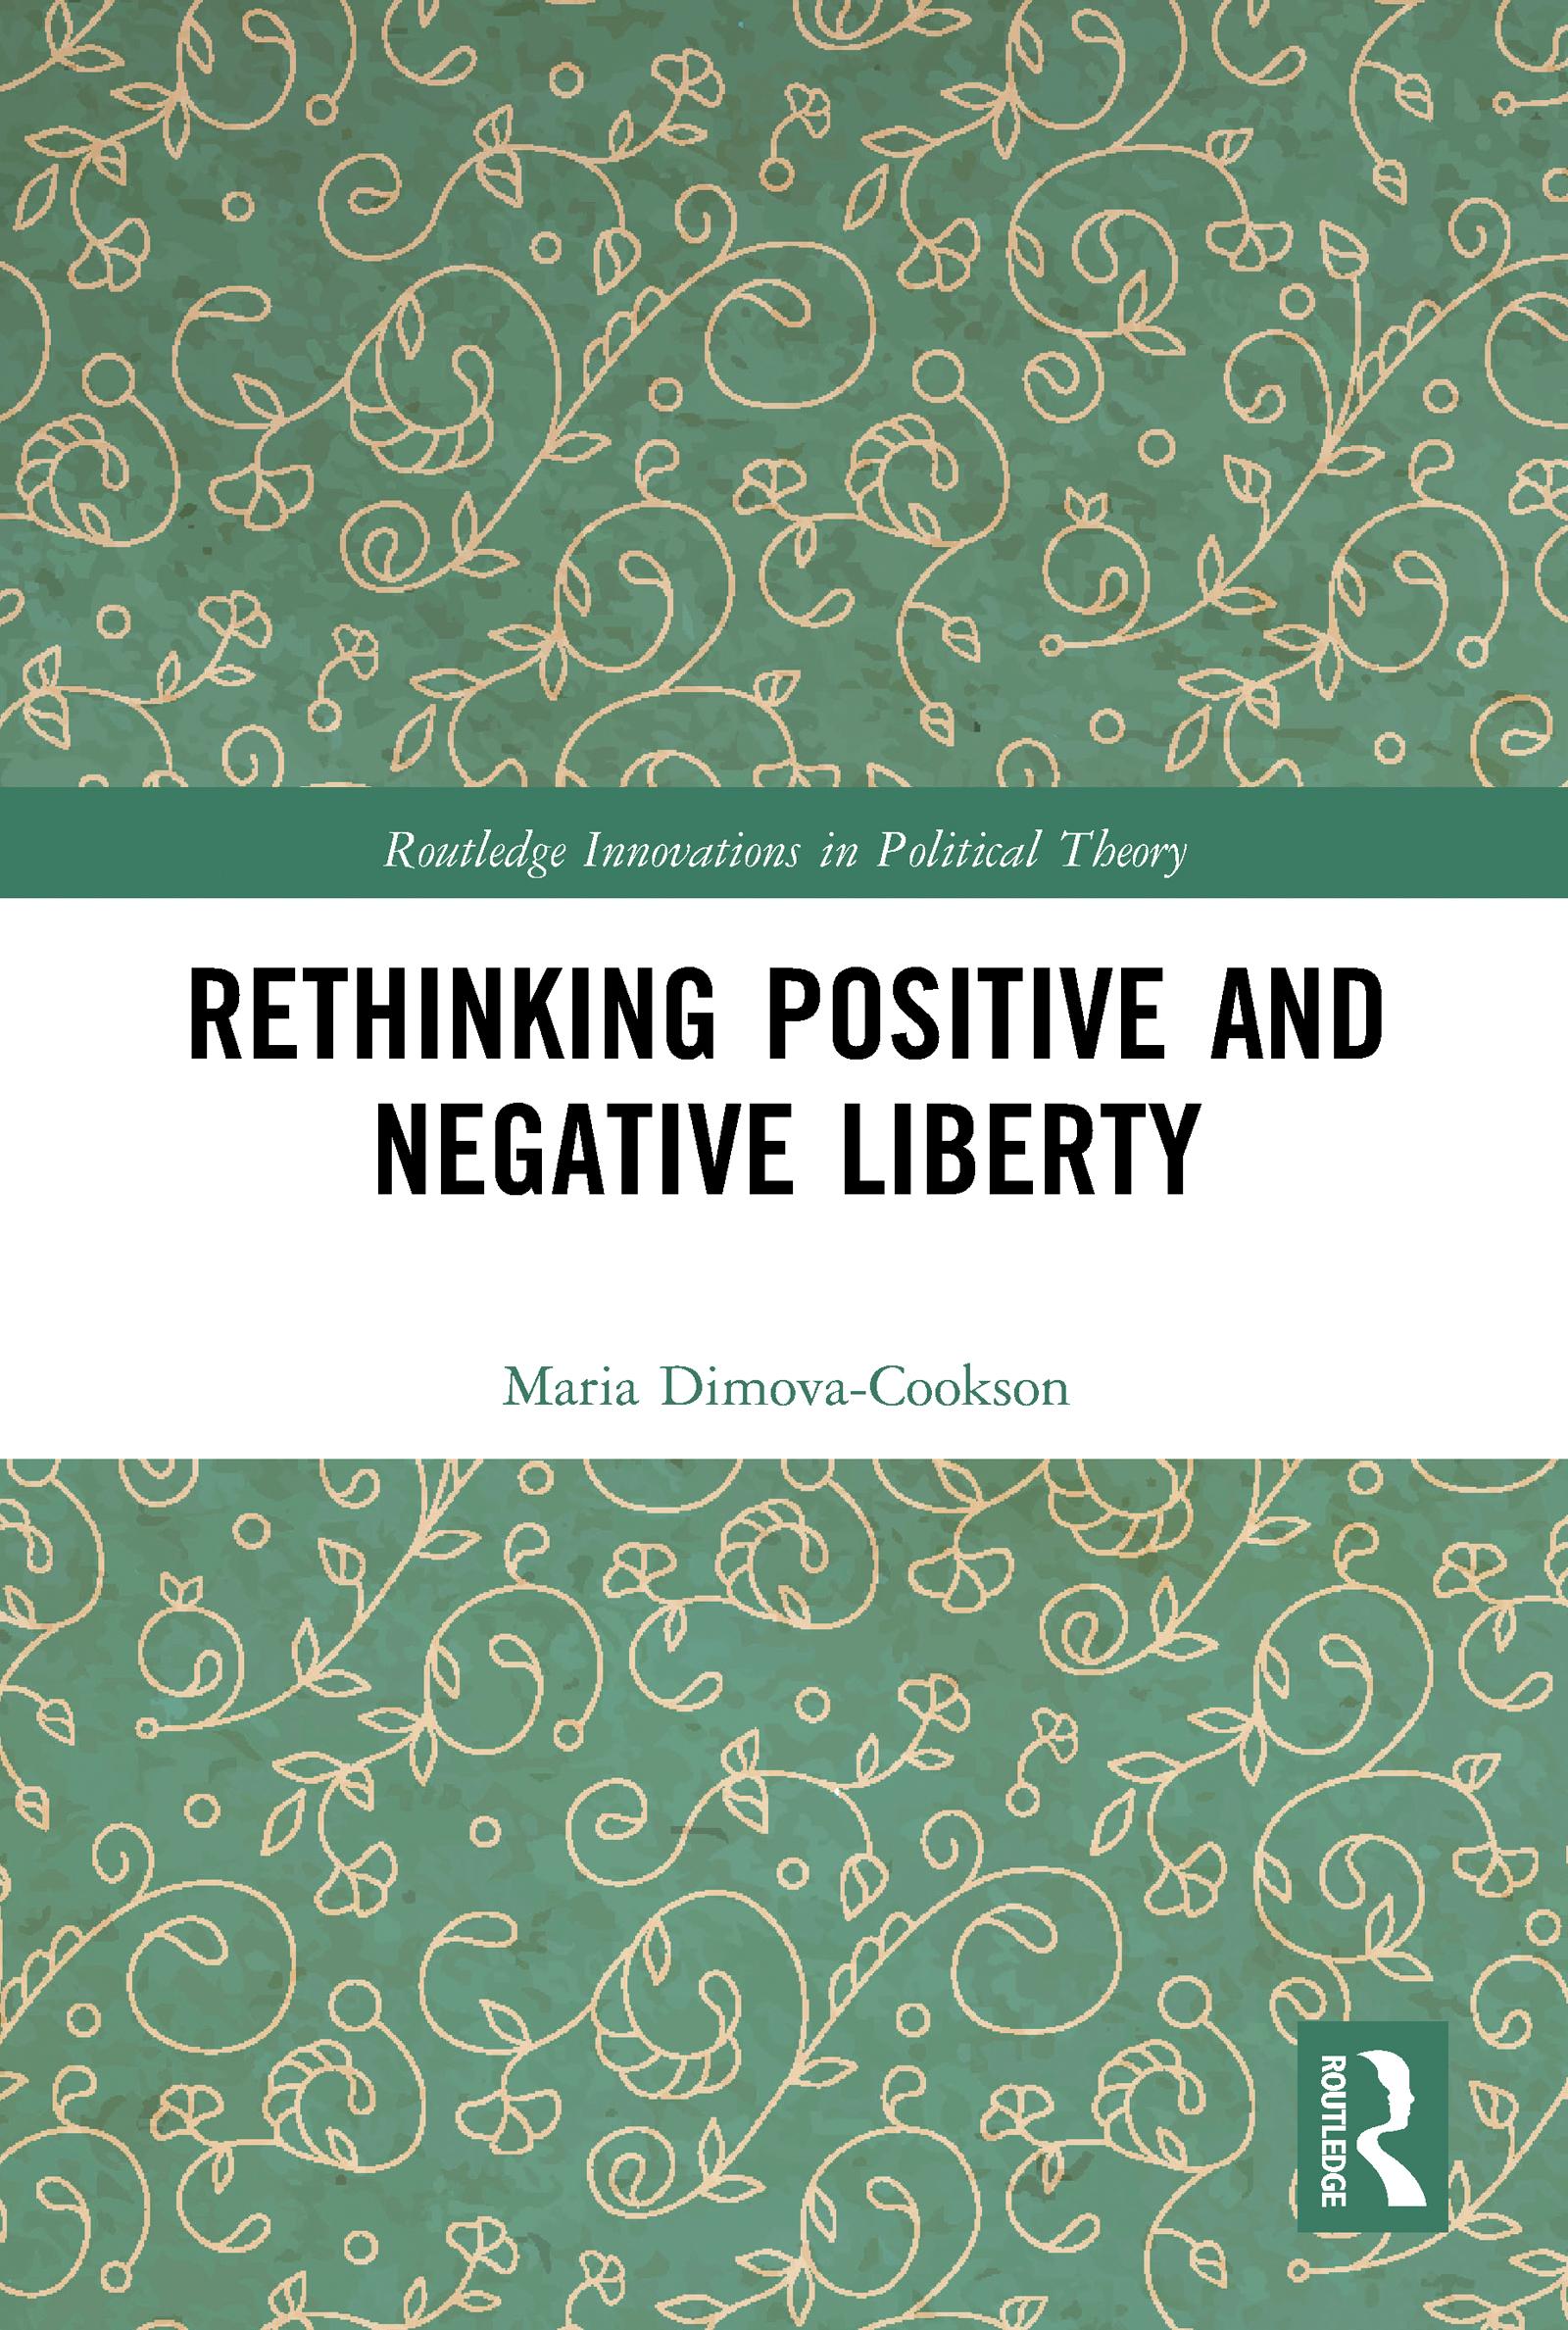 Rethinking Positive and Negative Liberty